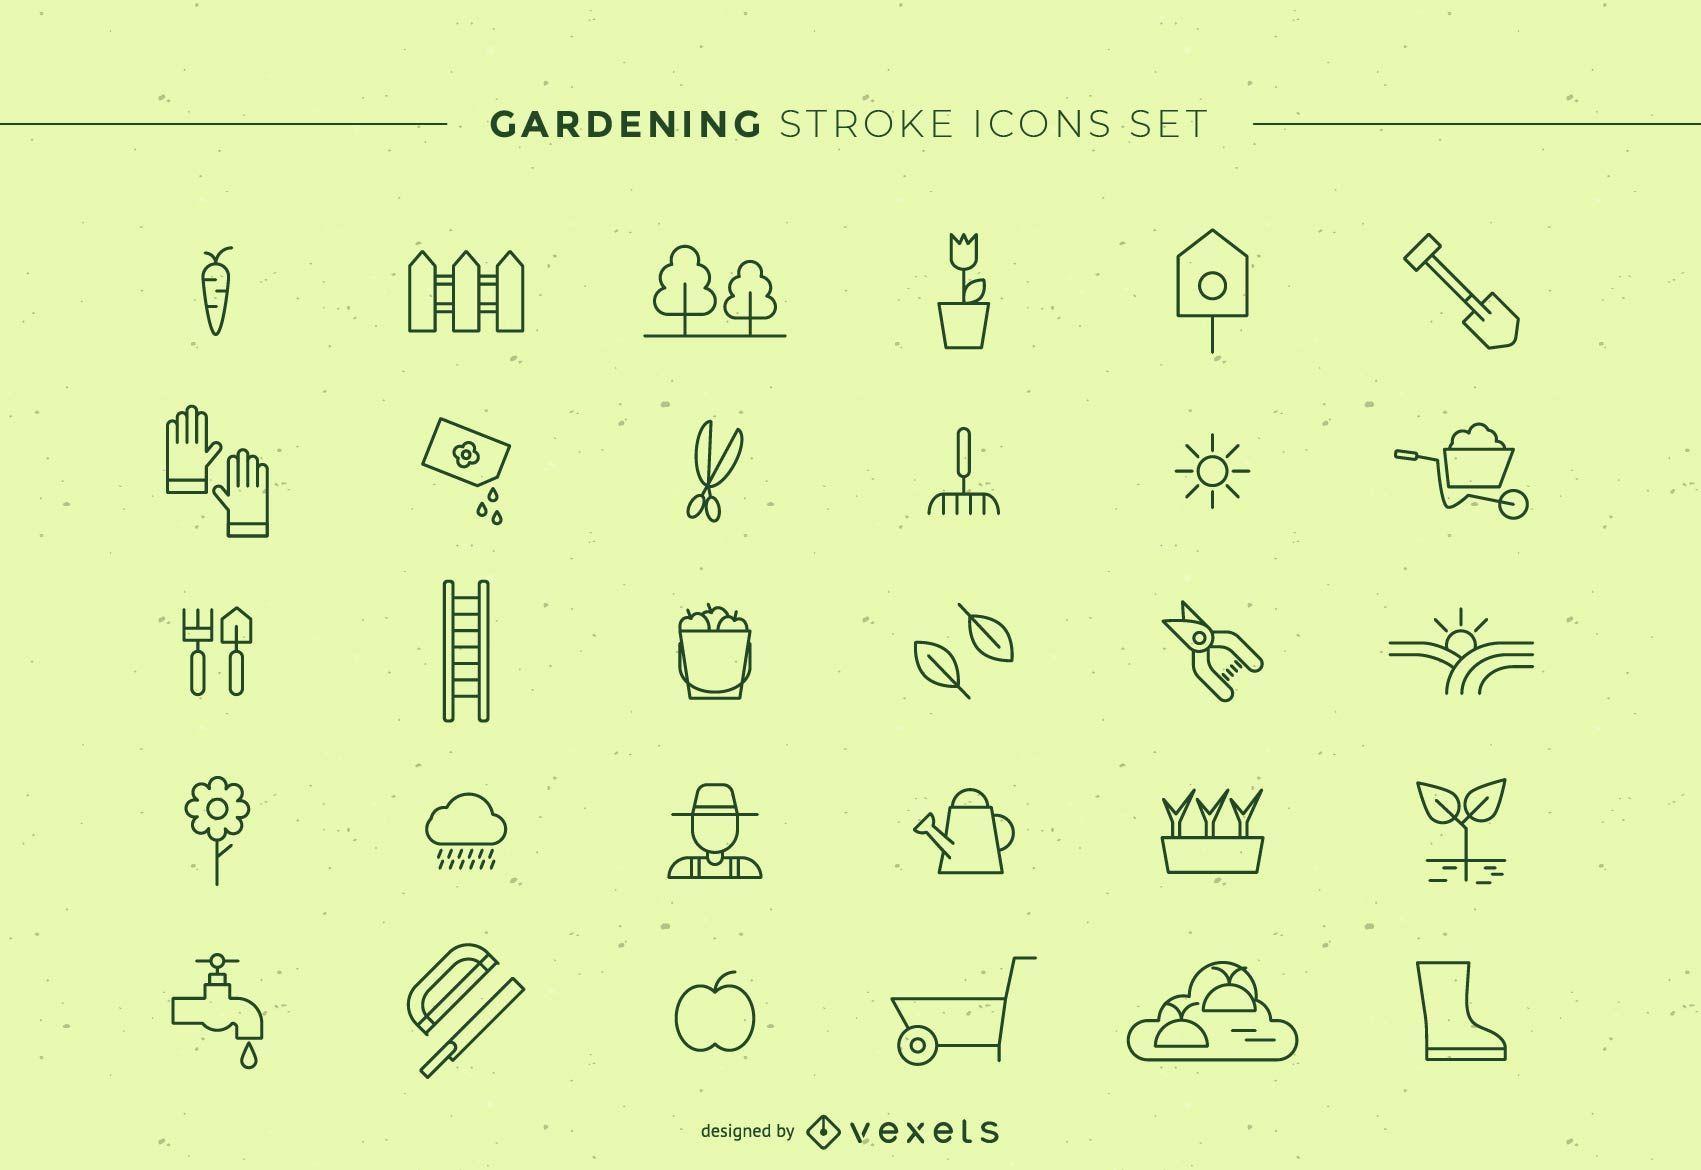 Gardening Stroke Icons Set